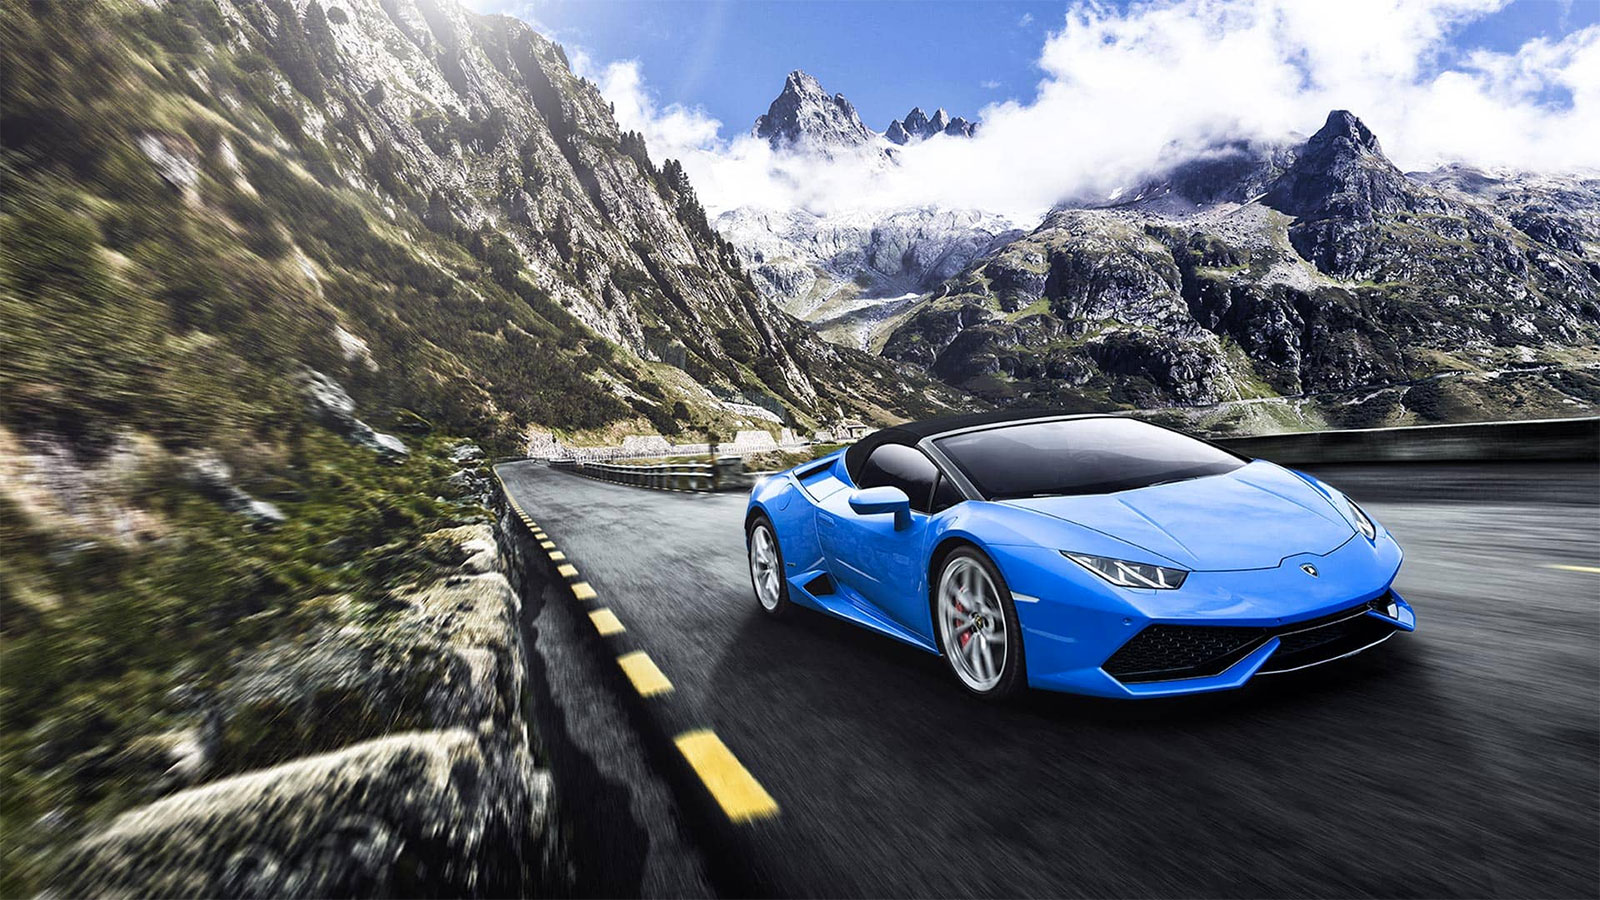 Lamborghini Huracan AWD Spyder - Inspiring Technology image 2